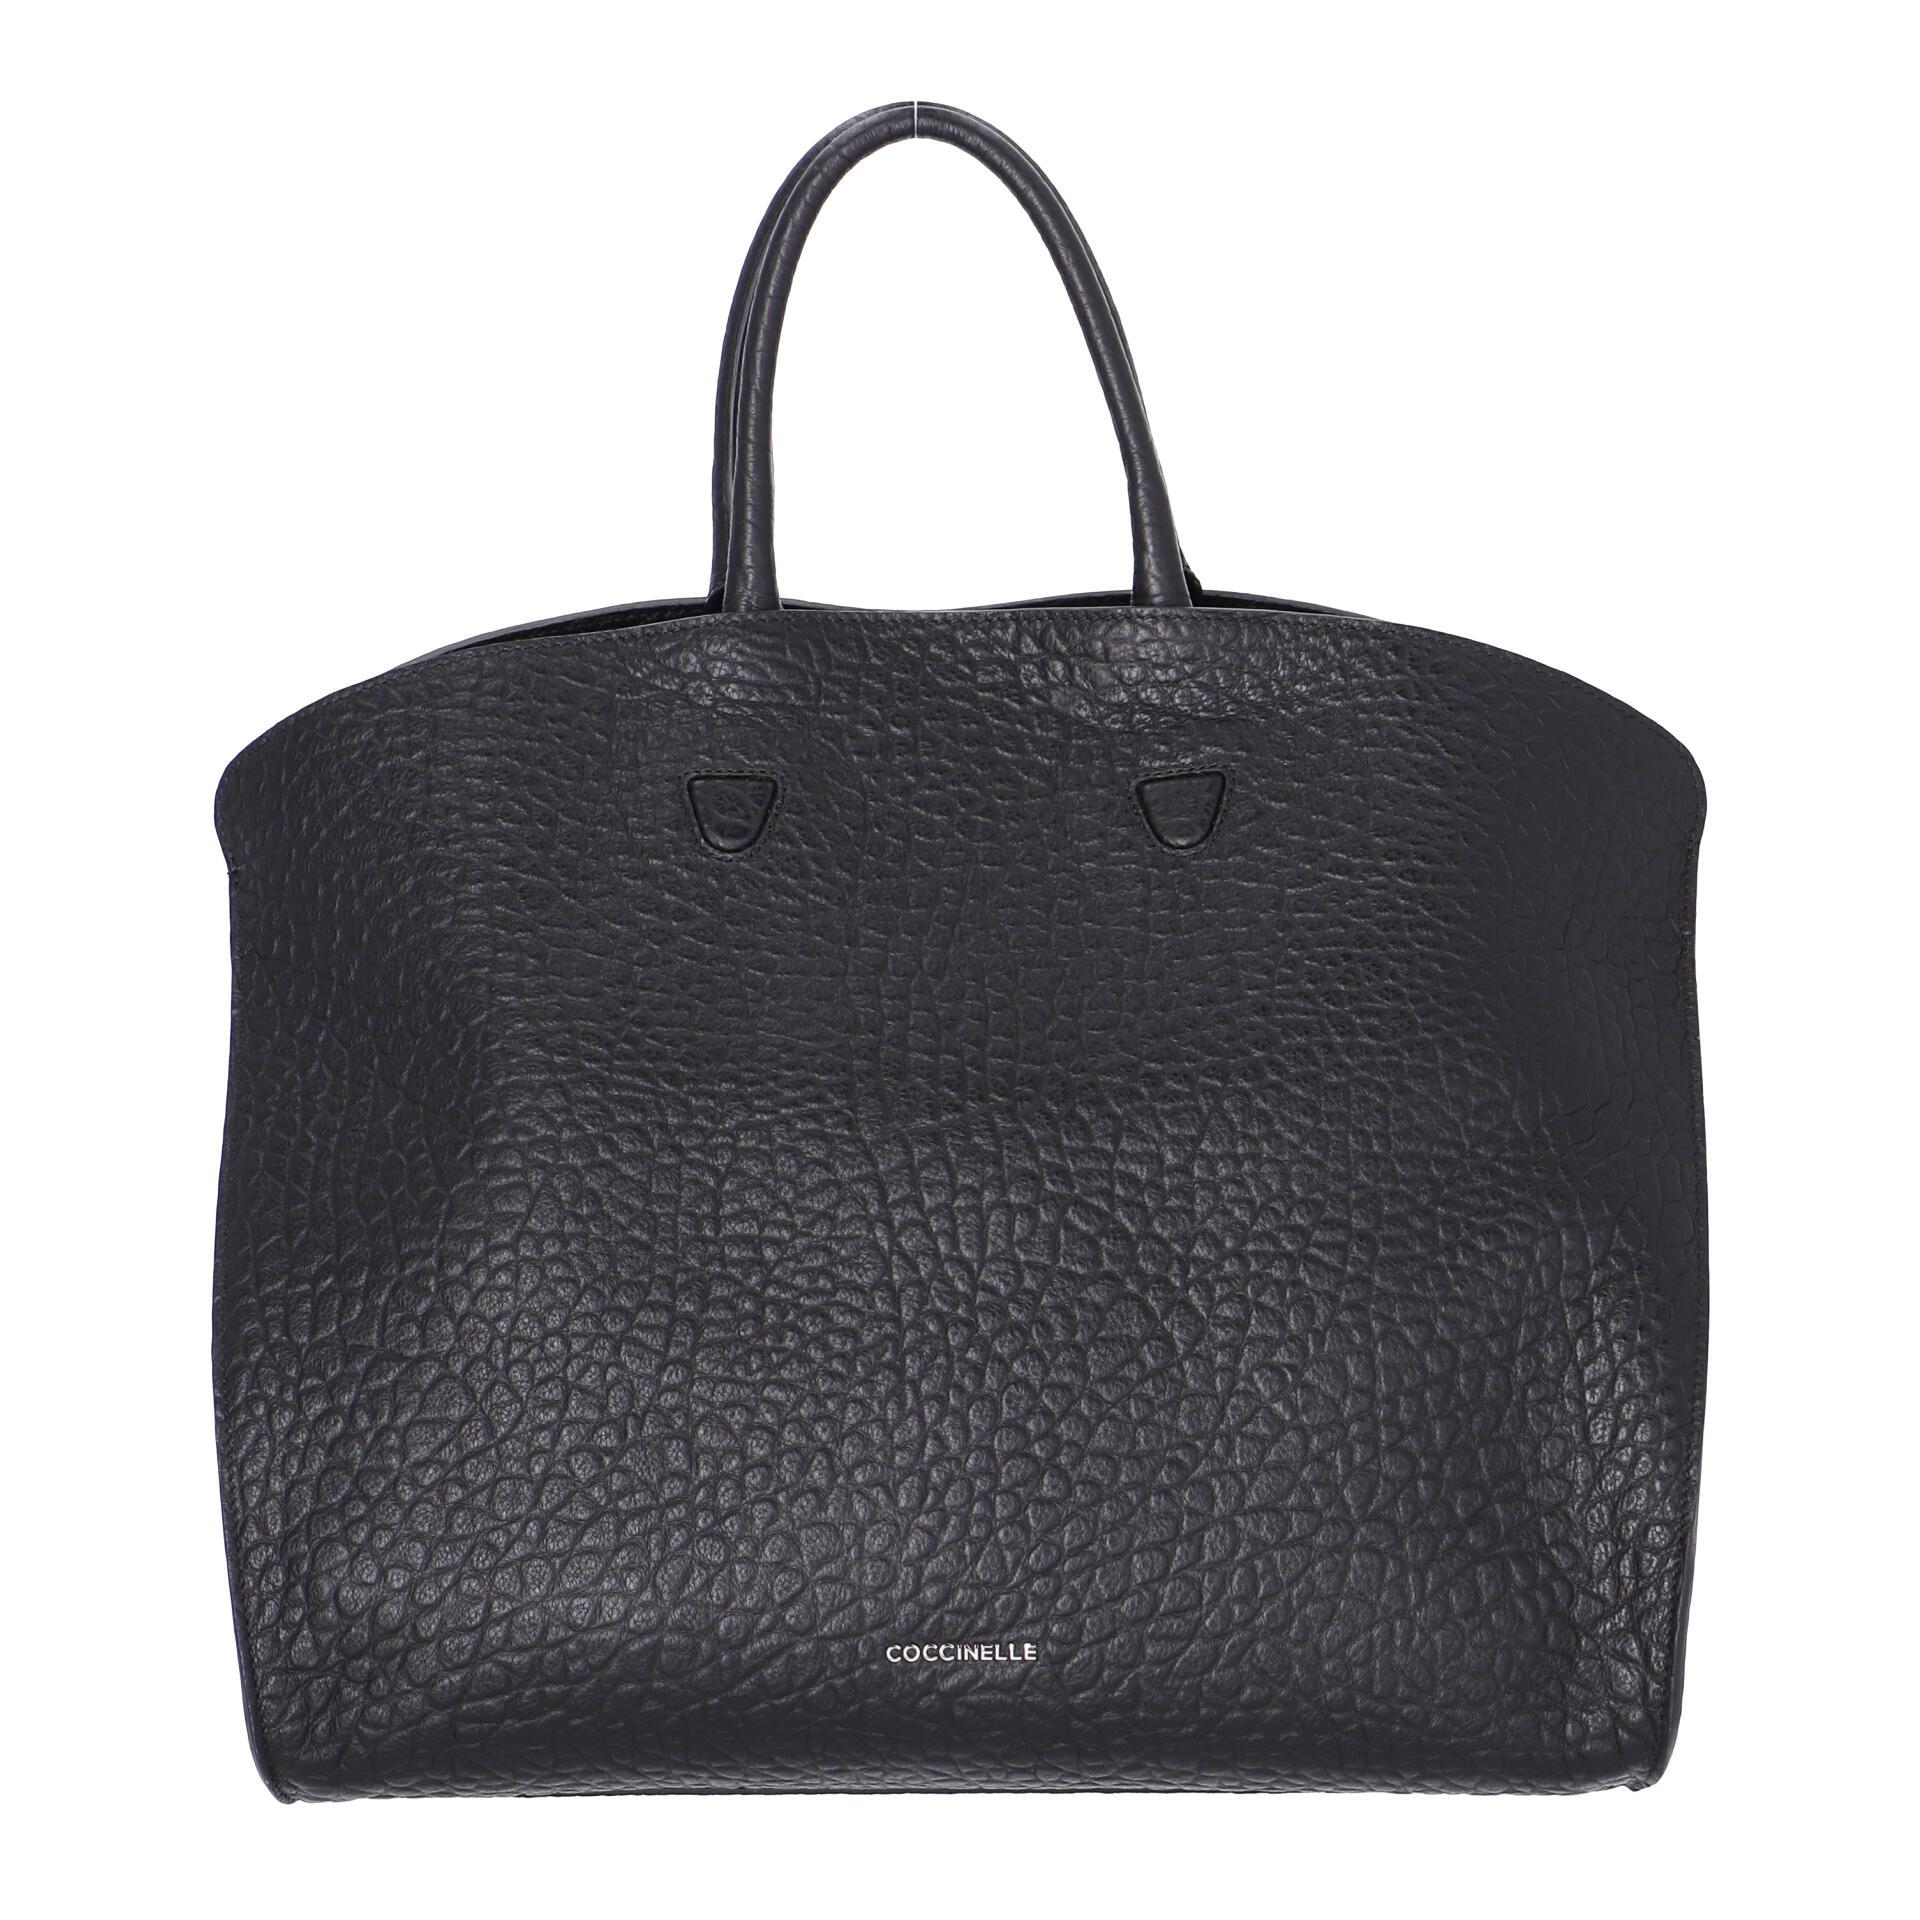 Coccinelle Angie Maxi Handtasche aus genarbtem Leder noir